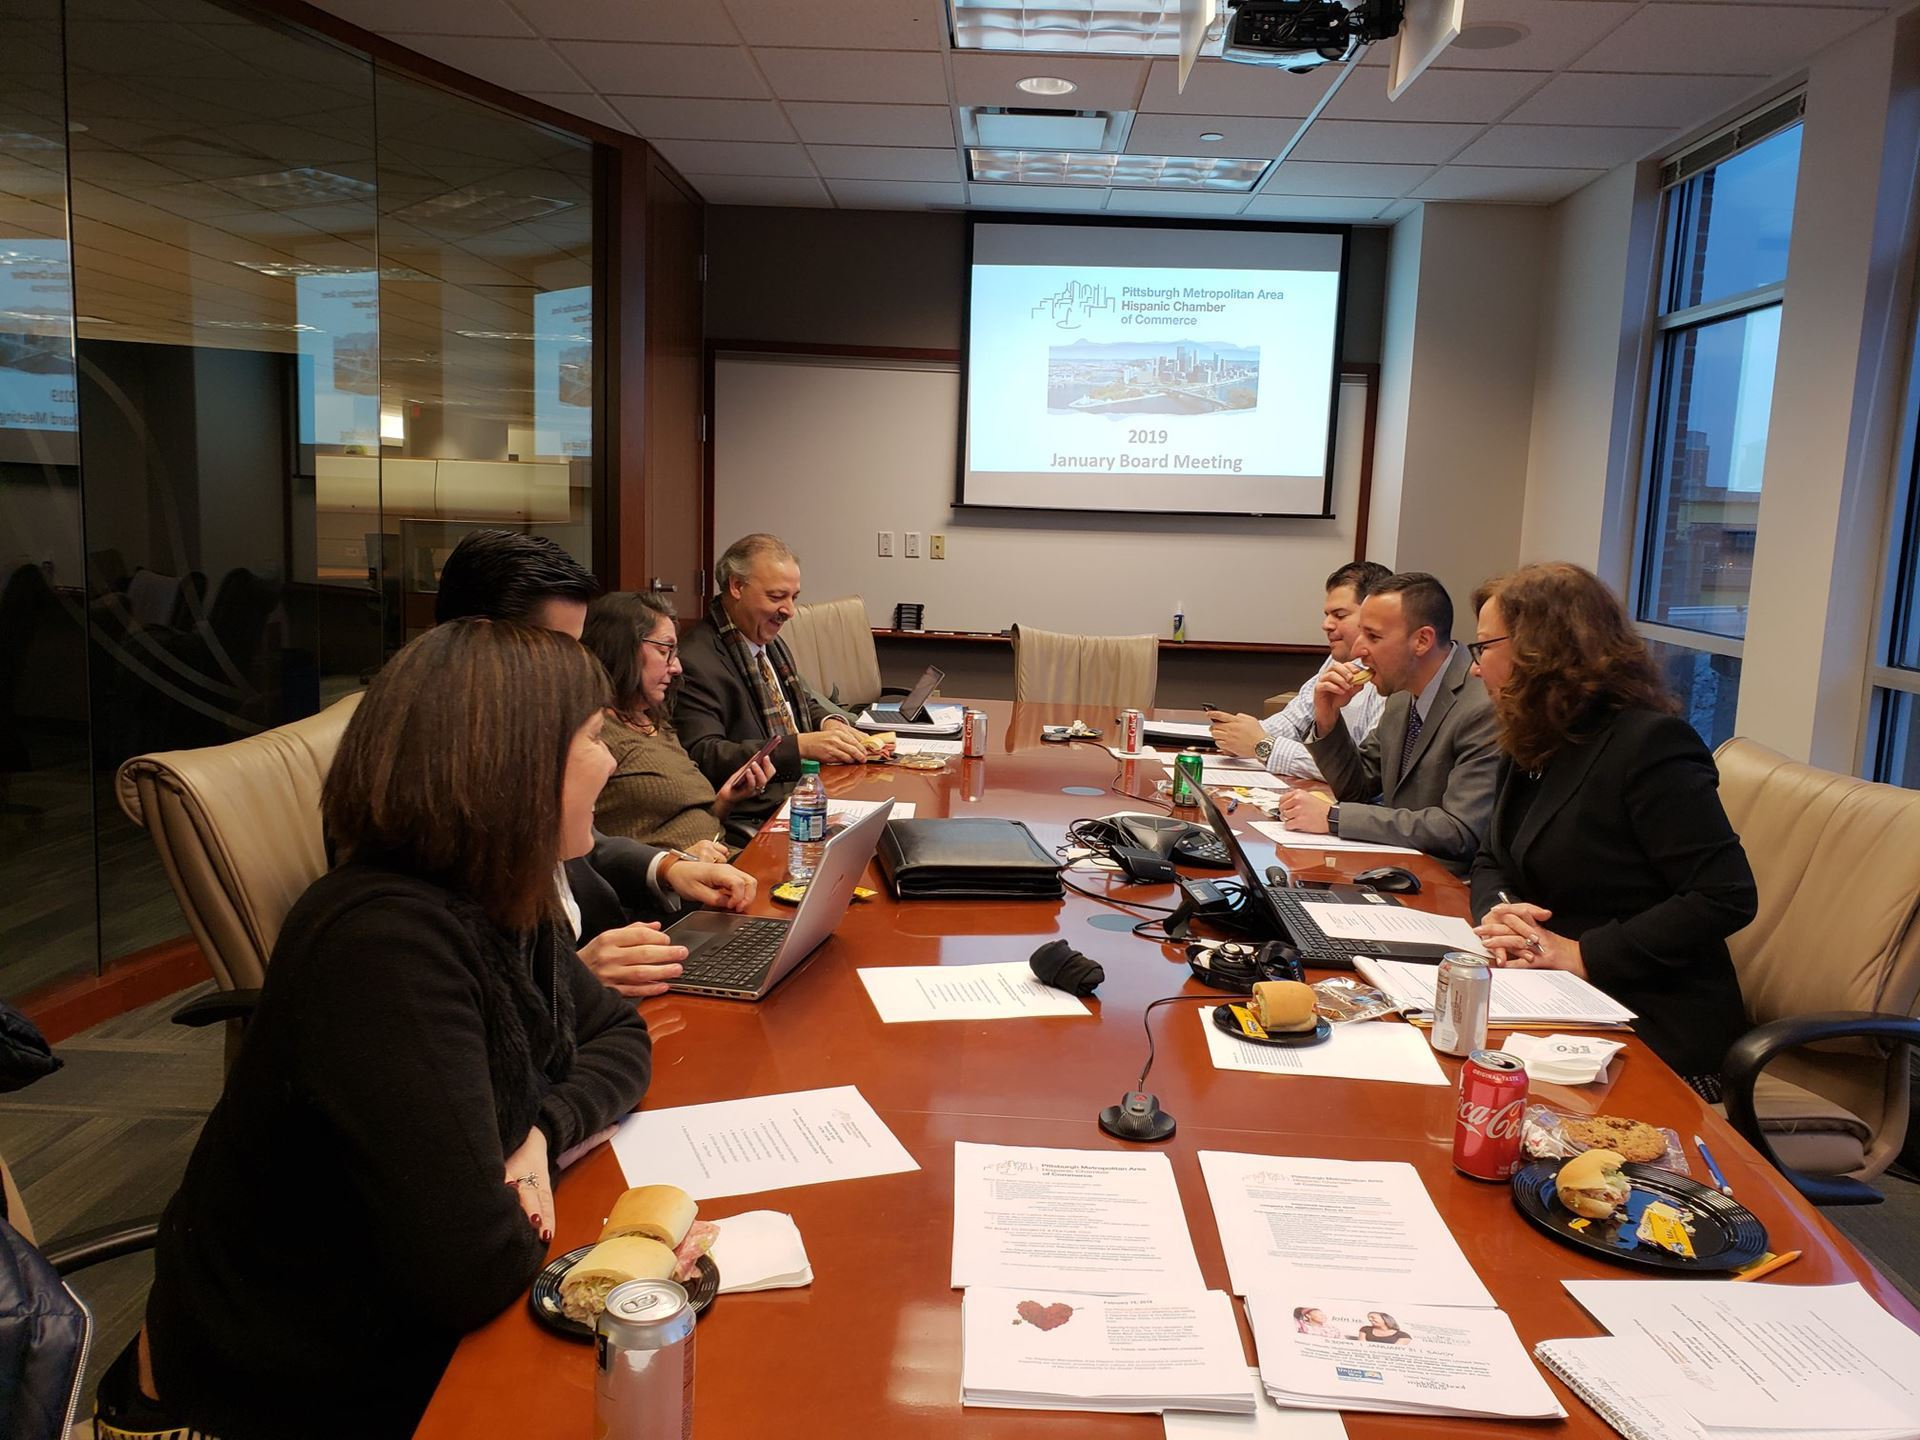 Pittsburgh Metropolitan Area Hispanic Chamber of Commerce